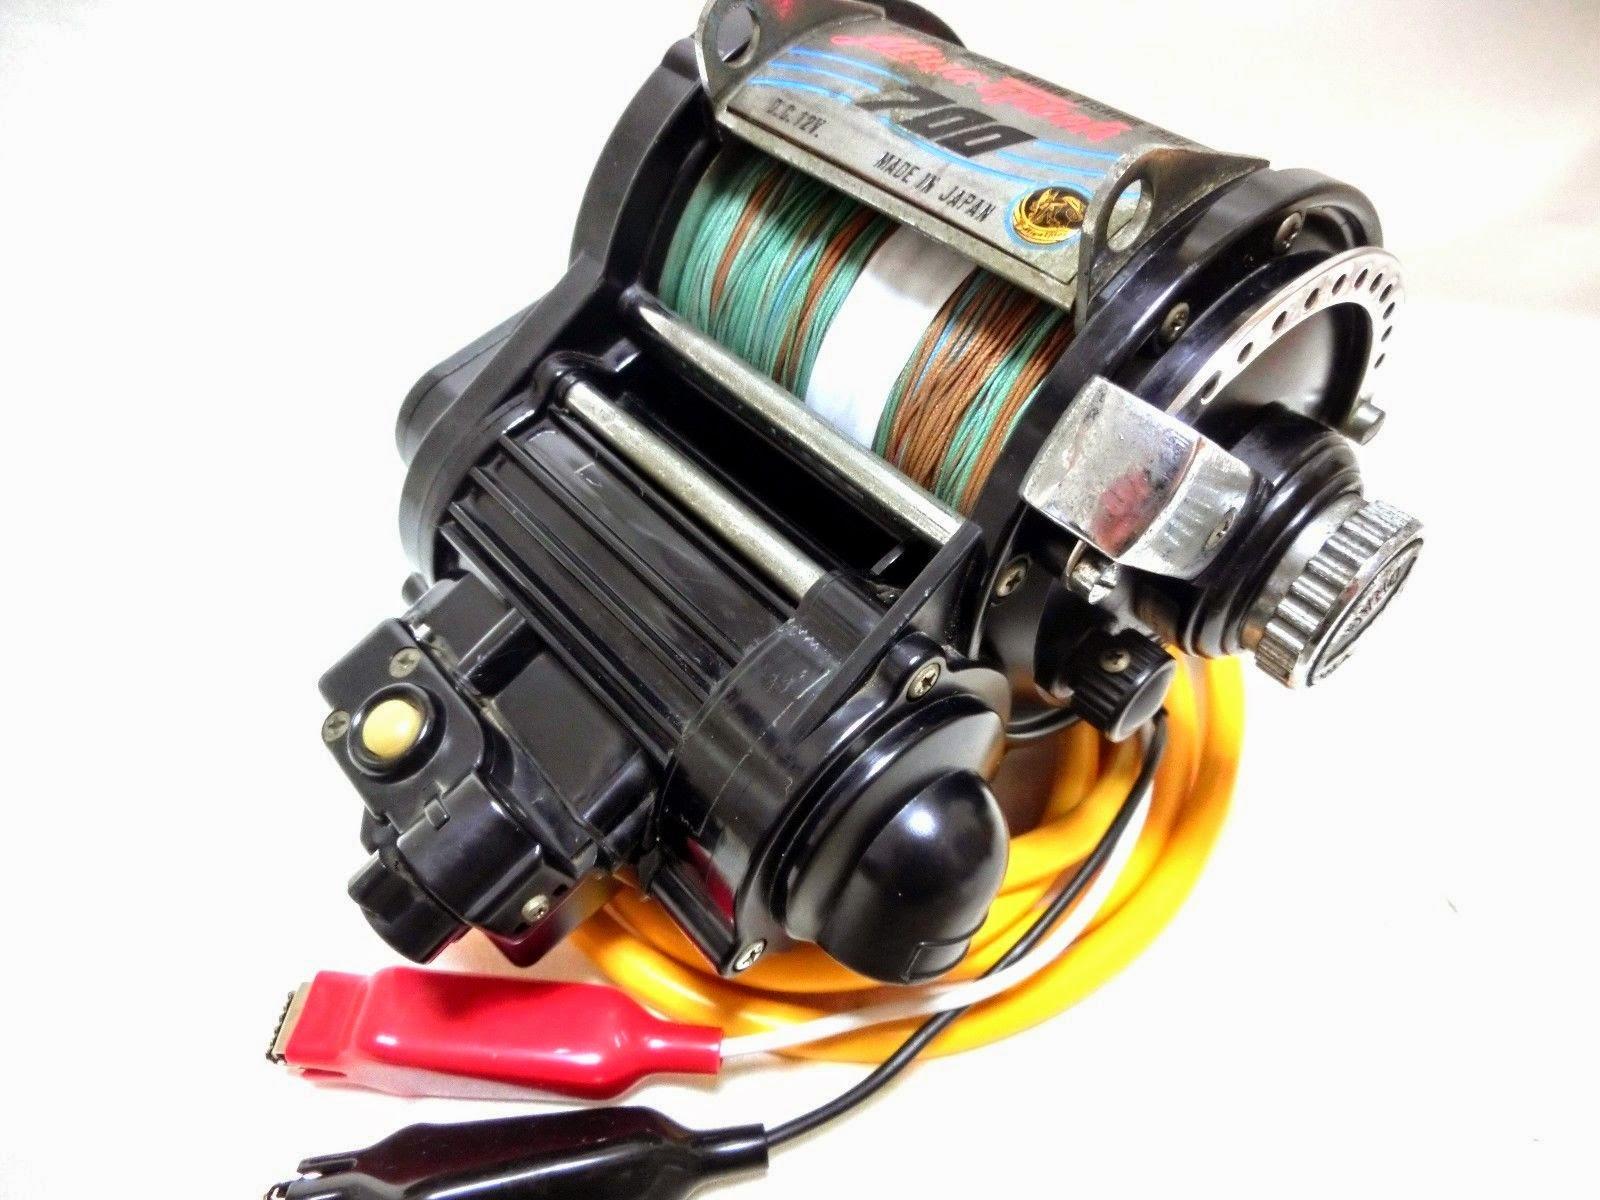 <Defective>Vintage MIYAMAE Miya Epoch 700 Electric Reel + Used line for Parts